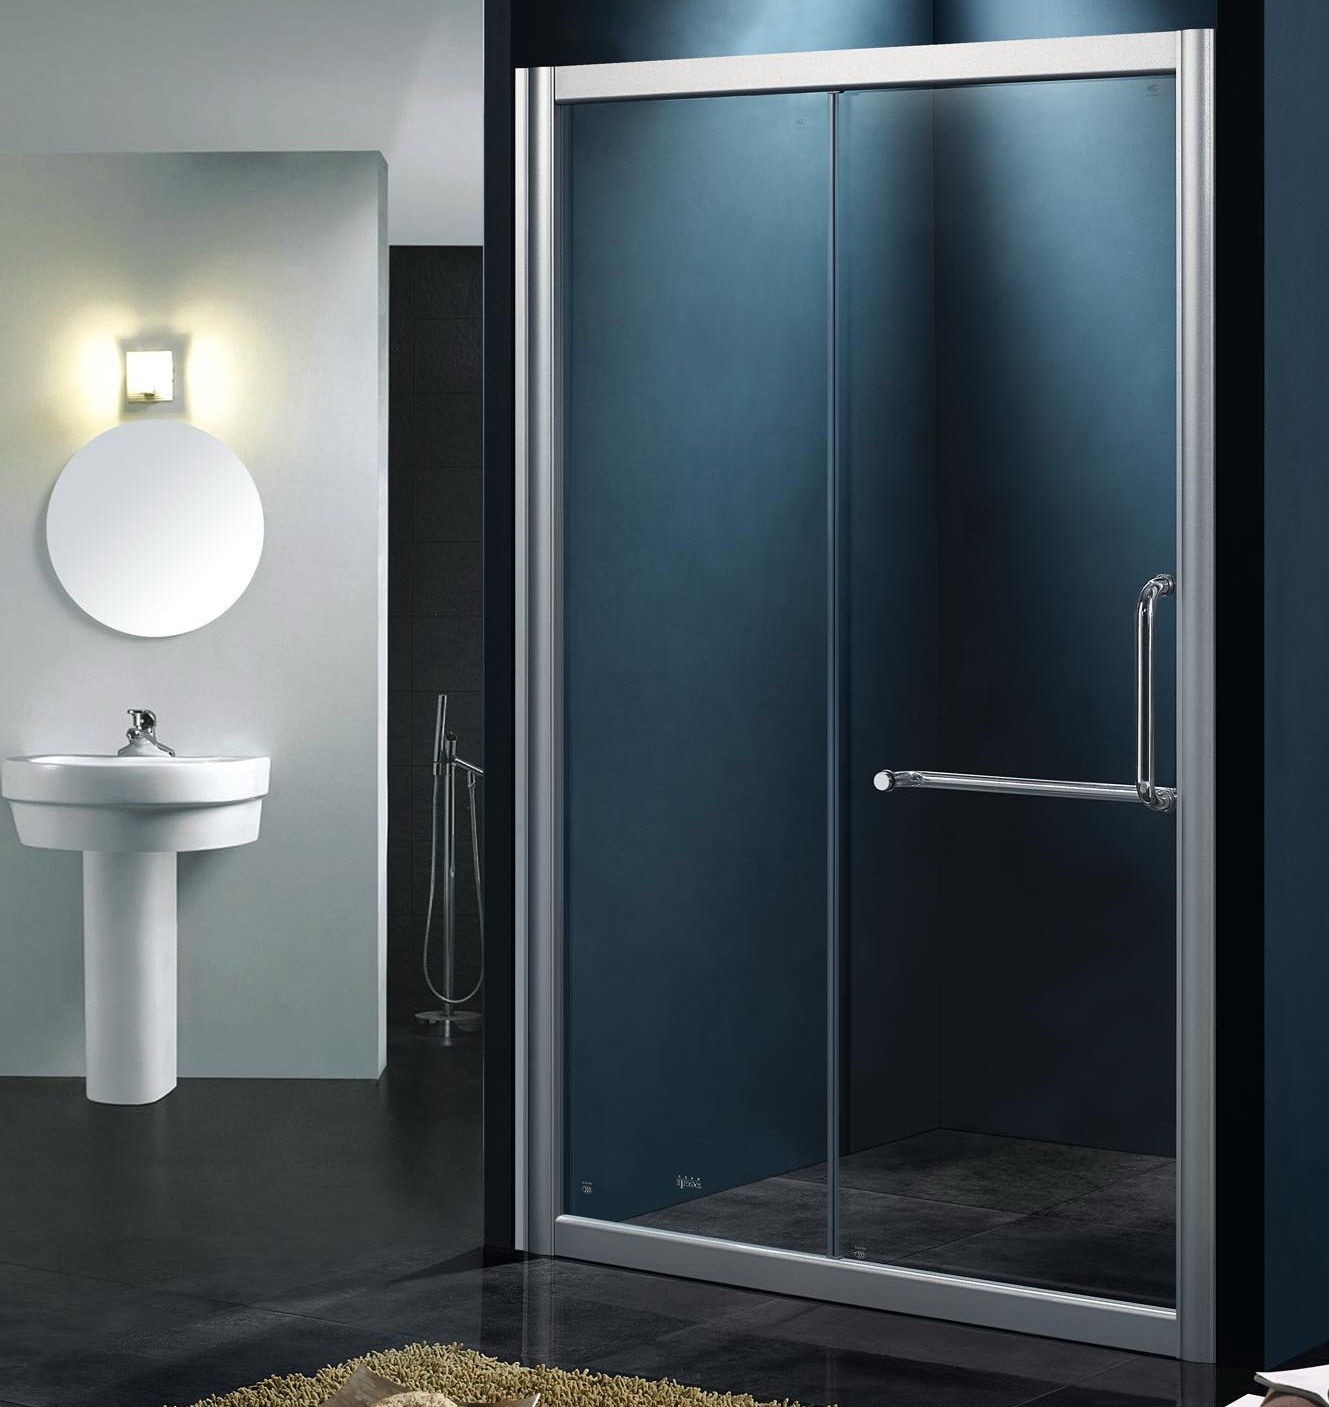 Bathroom Partitions Halifax glass partition doors image collections - glass door, interior